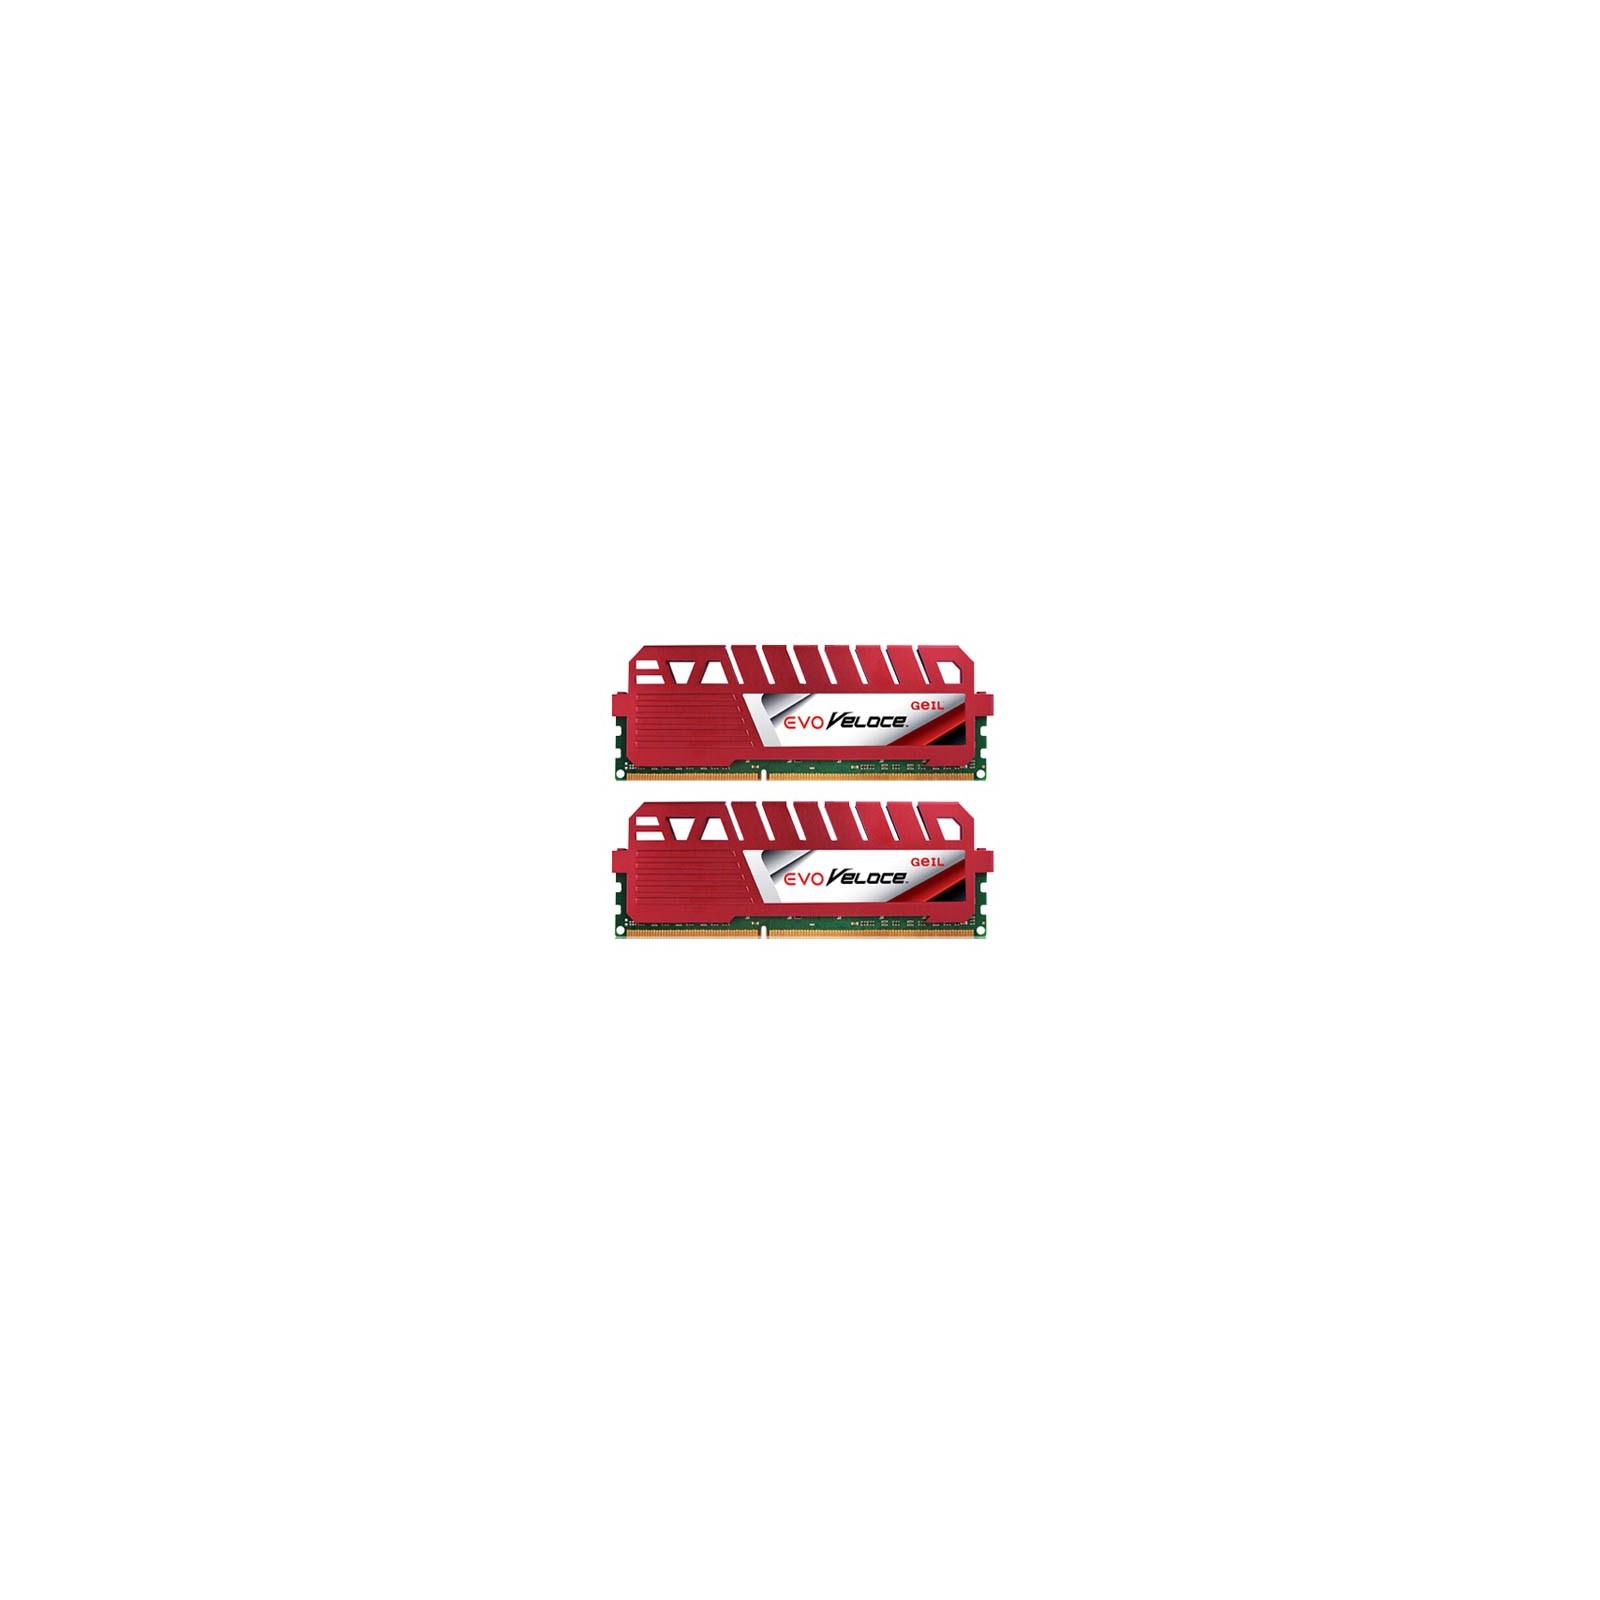 Модуль памяти для компьютера DDR3 16GB (2x8GB) 1600 MHz GEIL (GEV316GB1600C9DC)